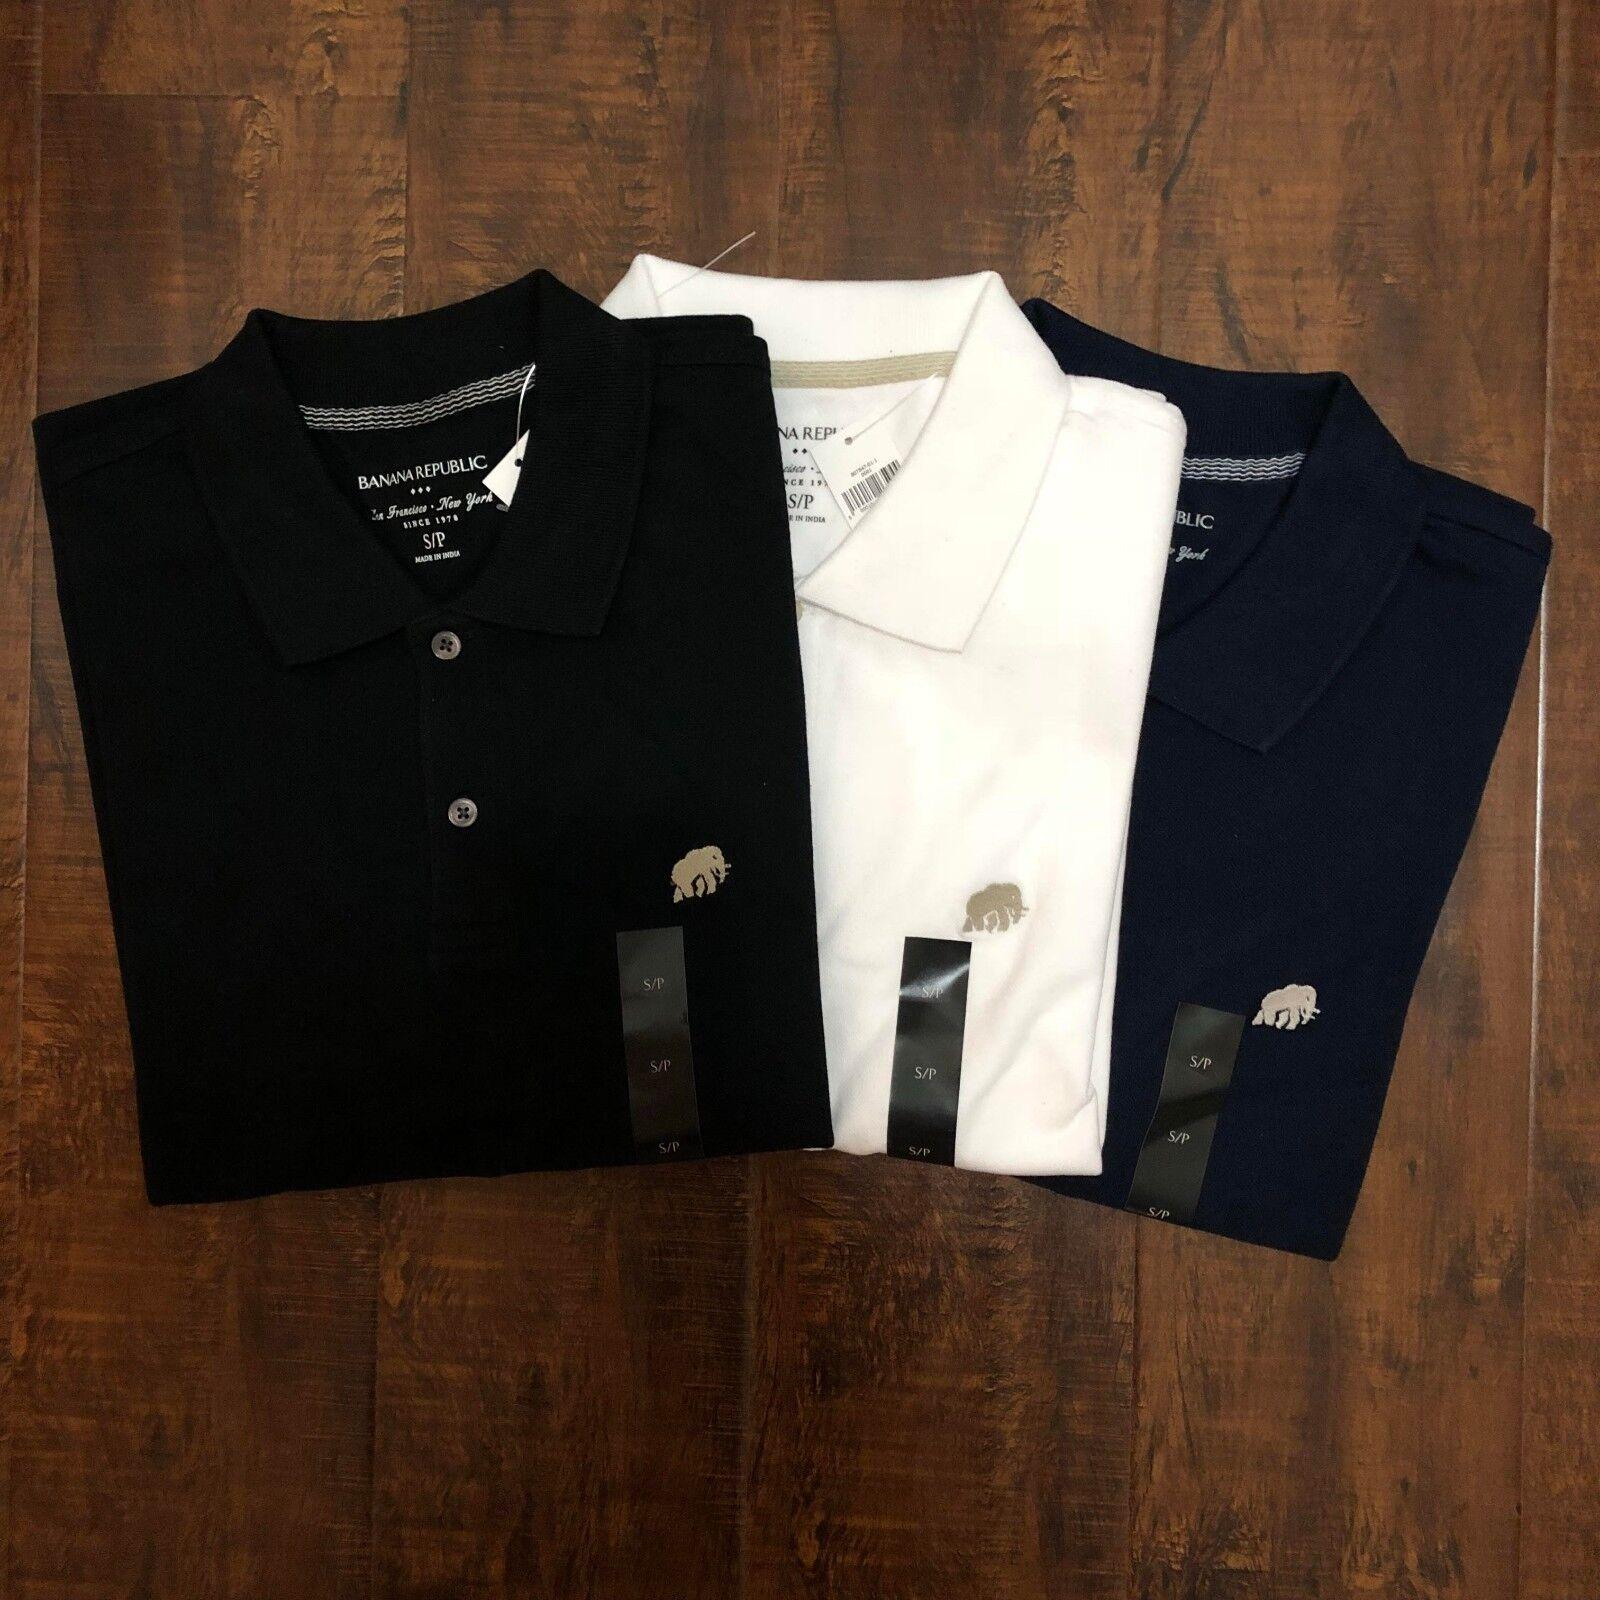 Men's NWT Banana Republic Untucked Fit M L//S Geometric Stretch Shirt Navy N50